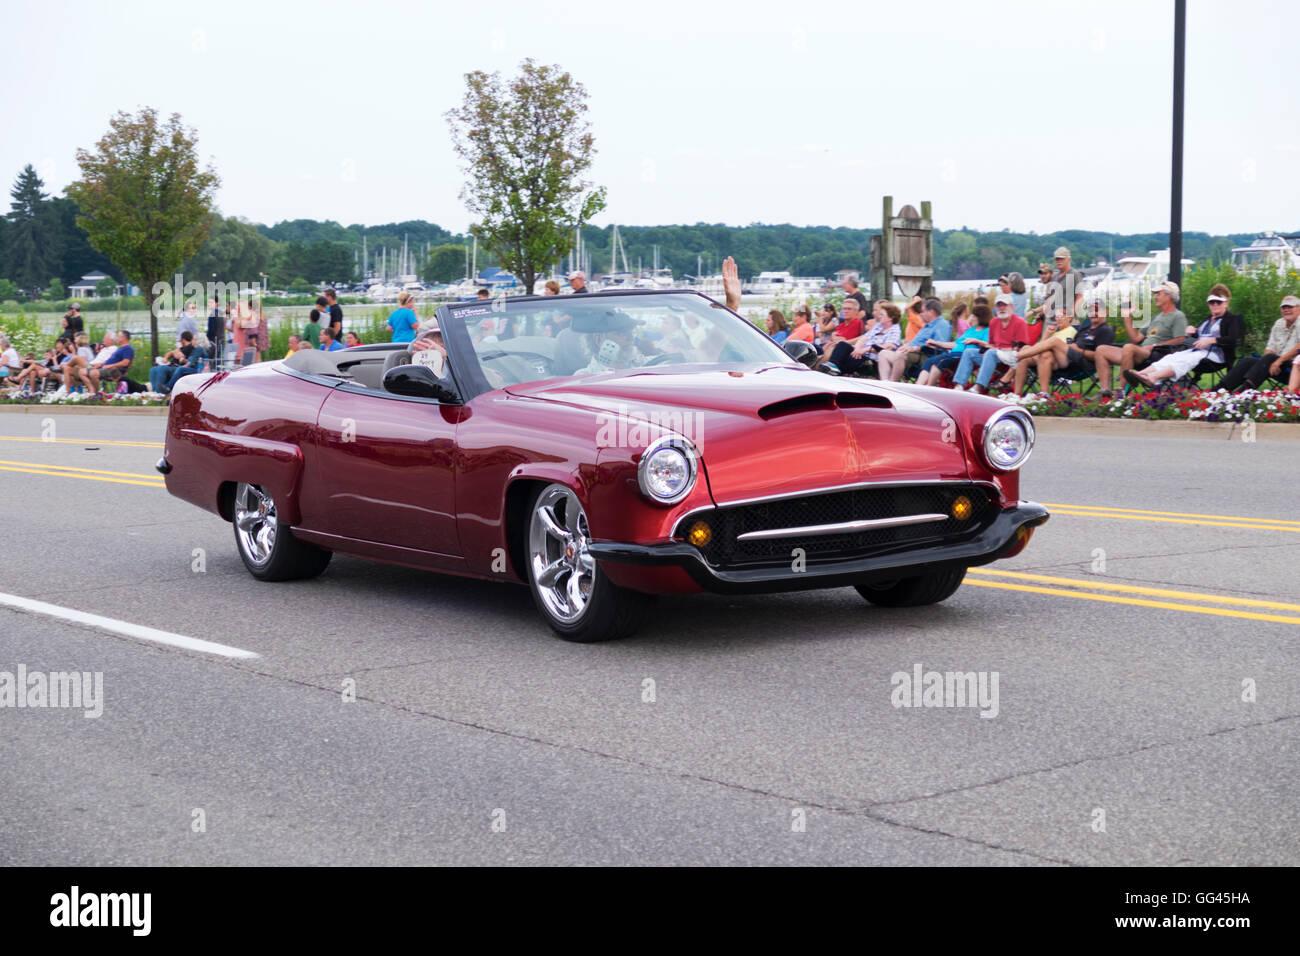 Remodeled 1950s era Mercury convertible participates in 2016 Annual Cruz In Parade through Montague, Michigan. Stock Photo